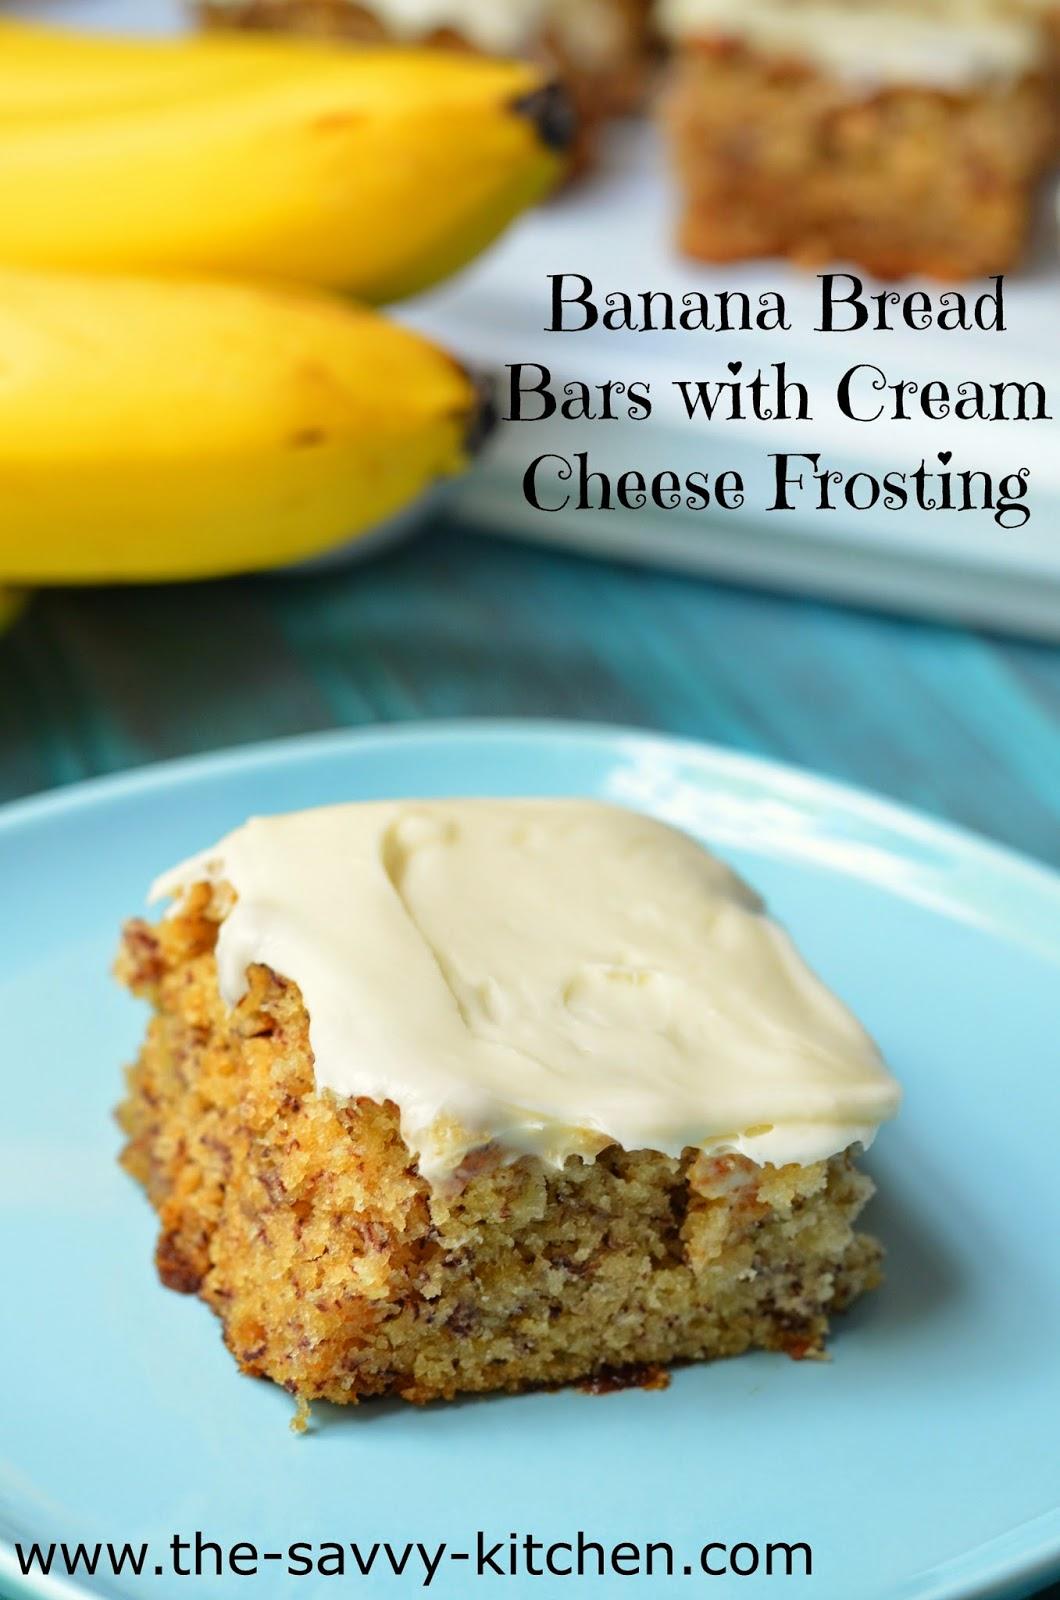 The Savvy Kitchen Banana Bread Bars With Cream Cheese